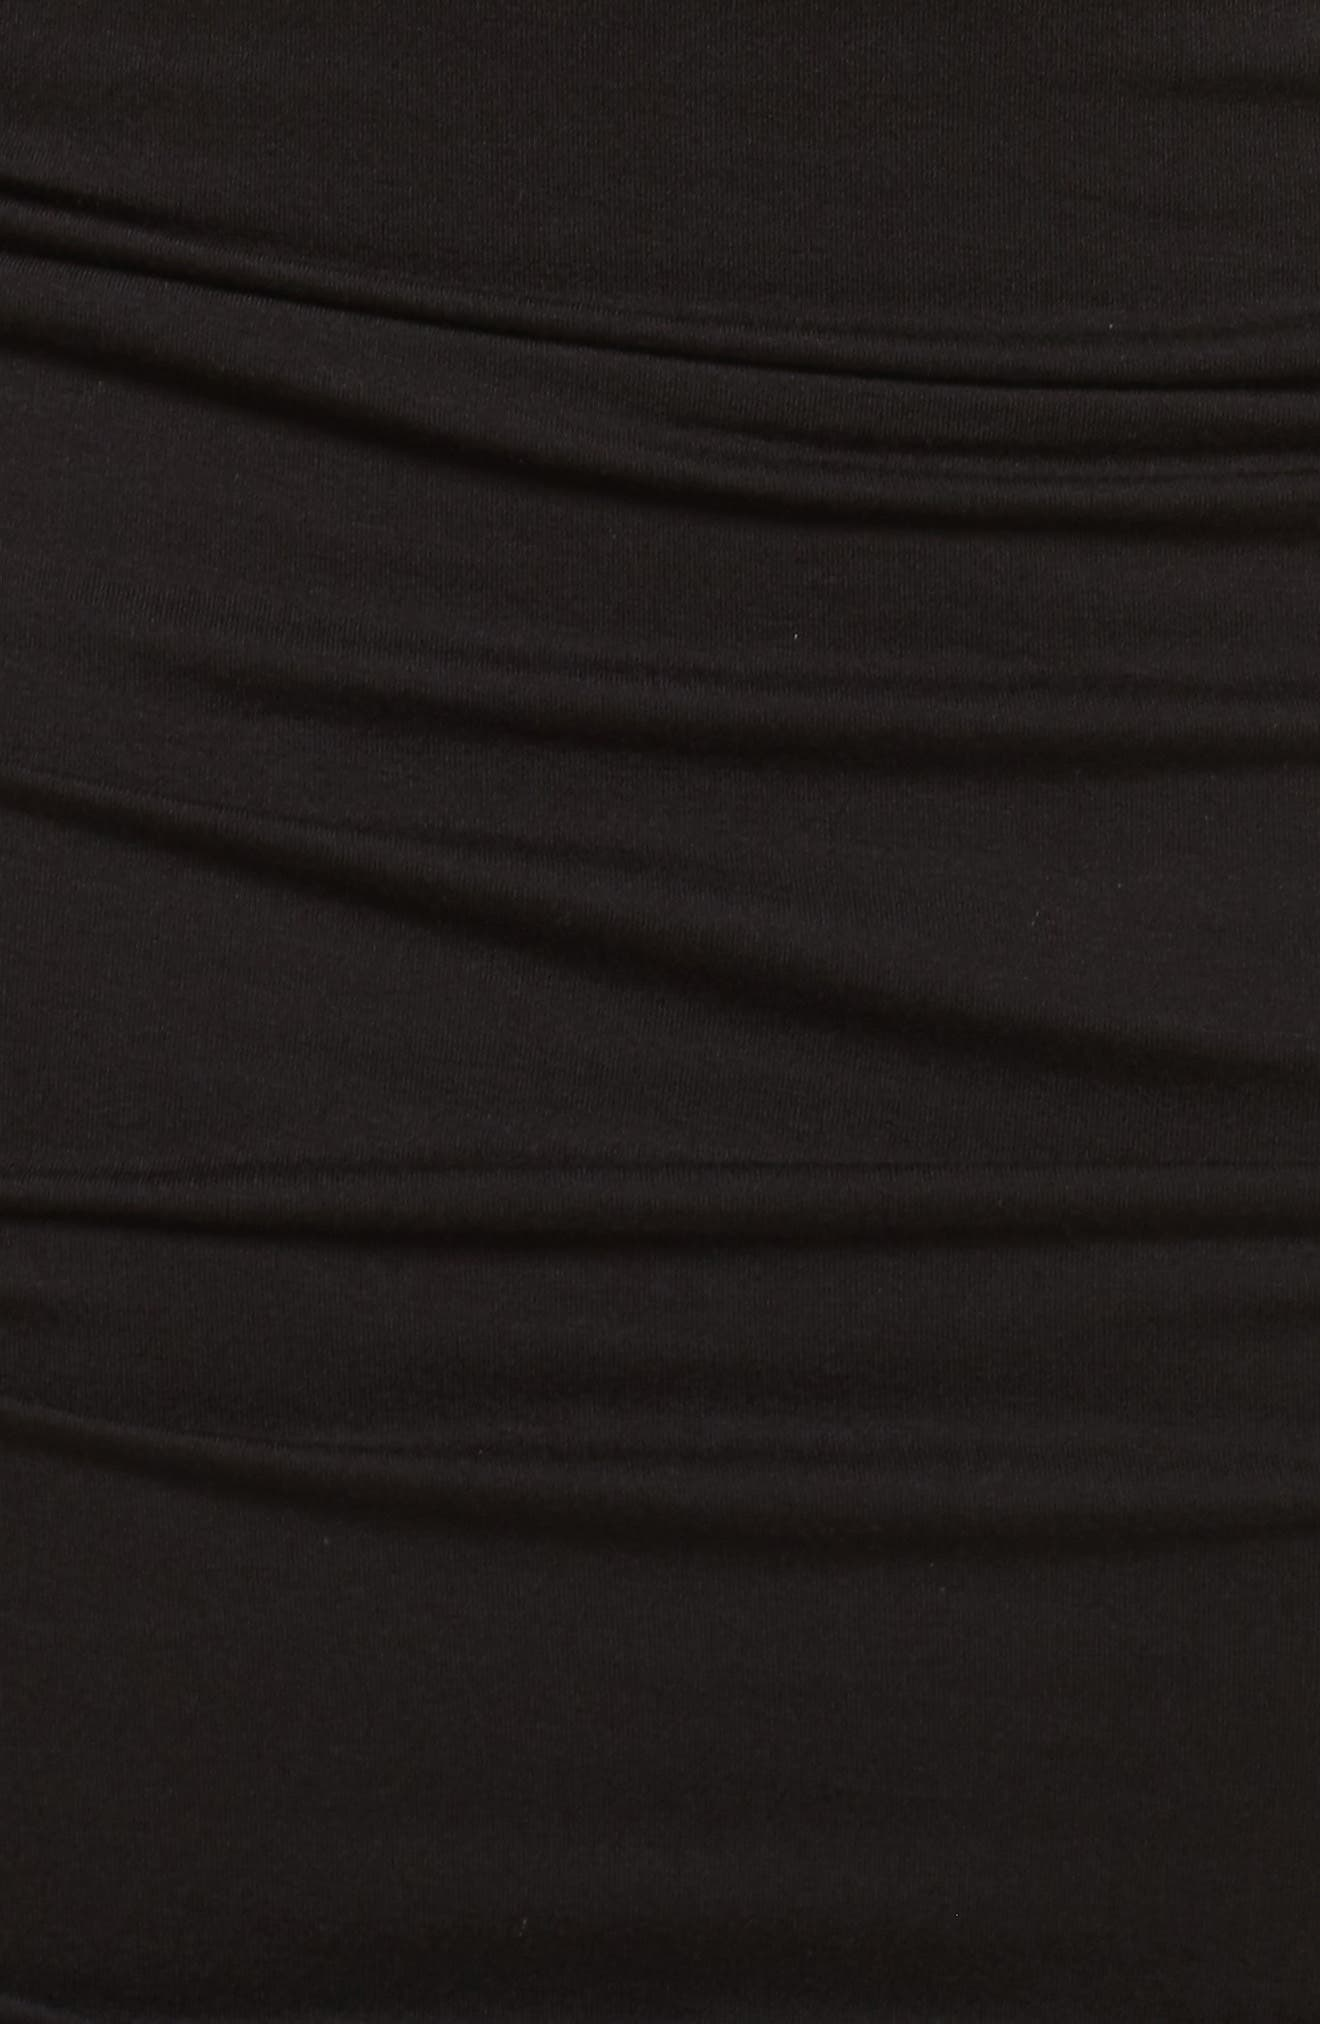 Slit Sleeve Knit Sheath Dress,                             Alternate thumbnail 9, color,